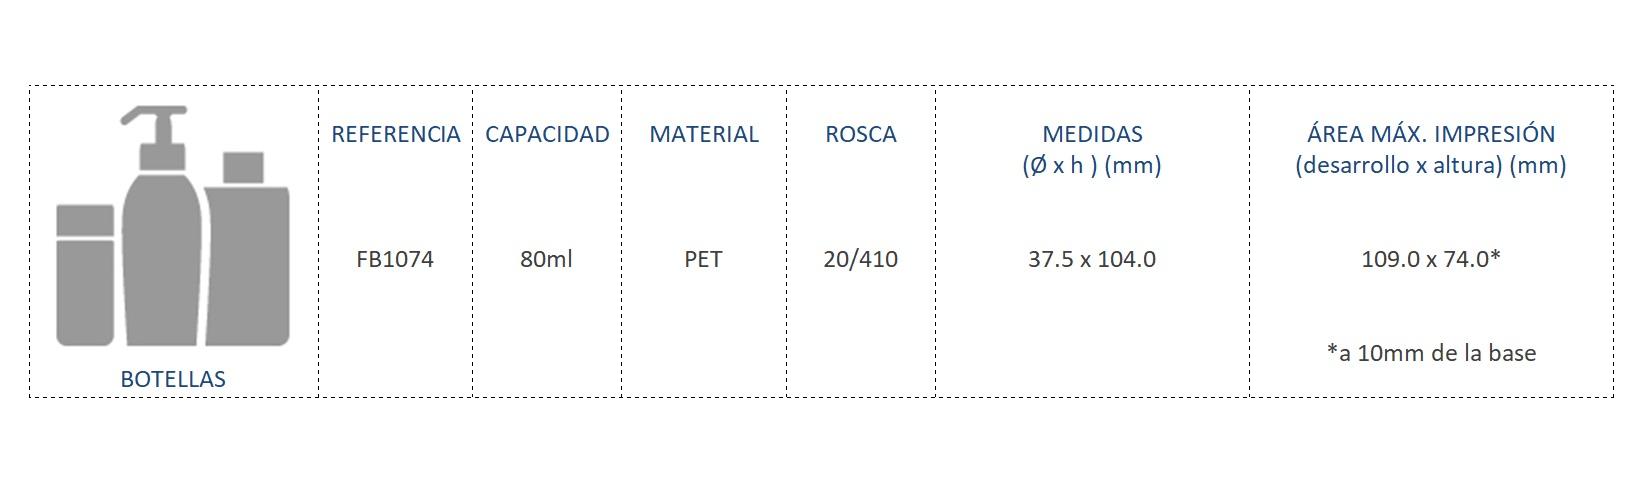 Cuadro de materiales FB1074